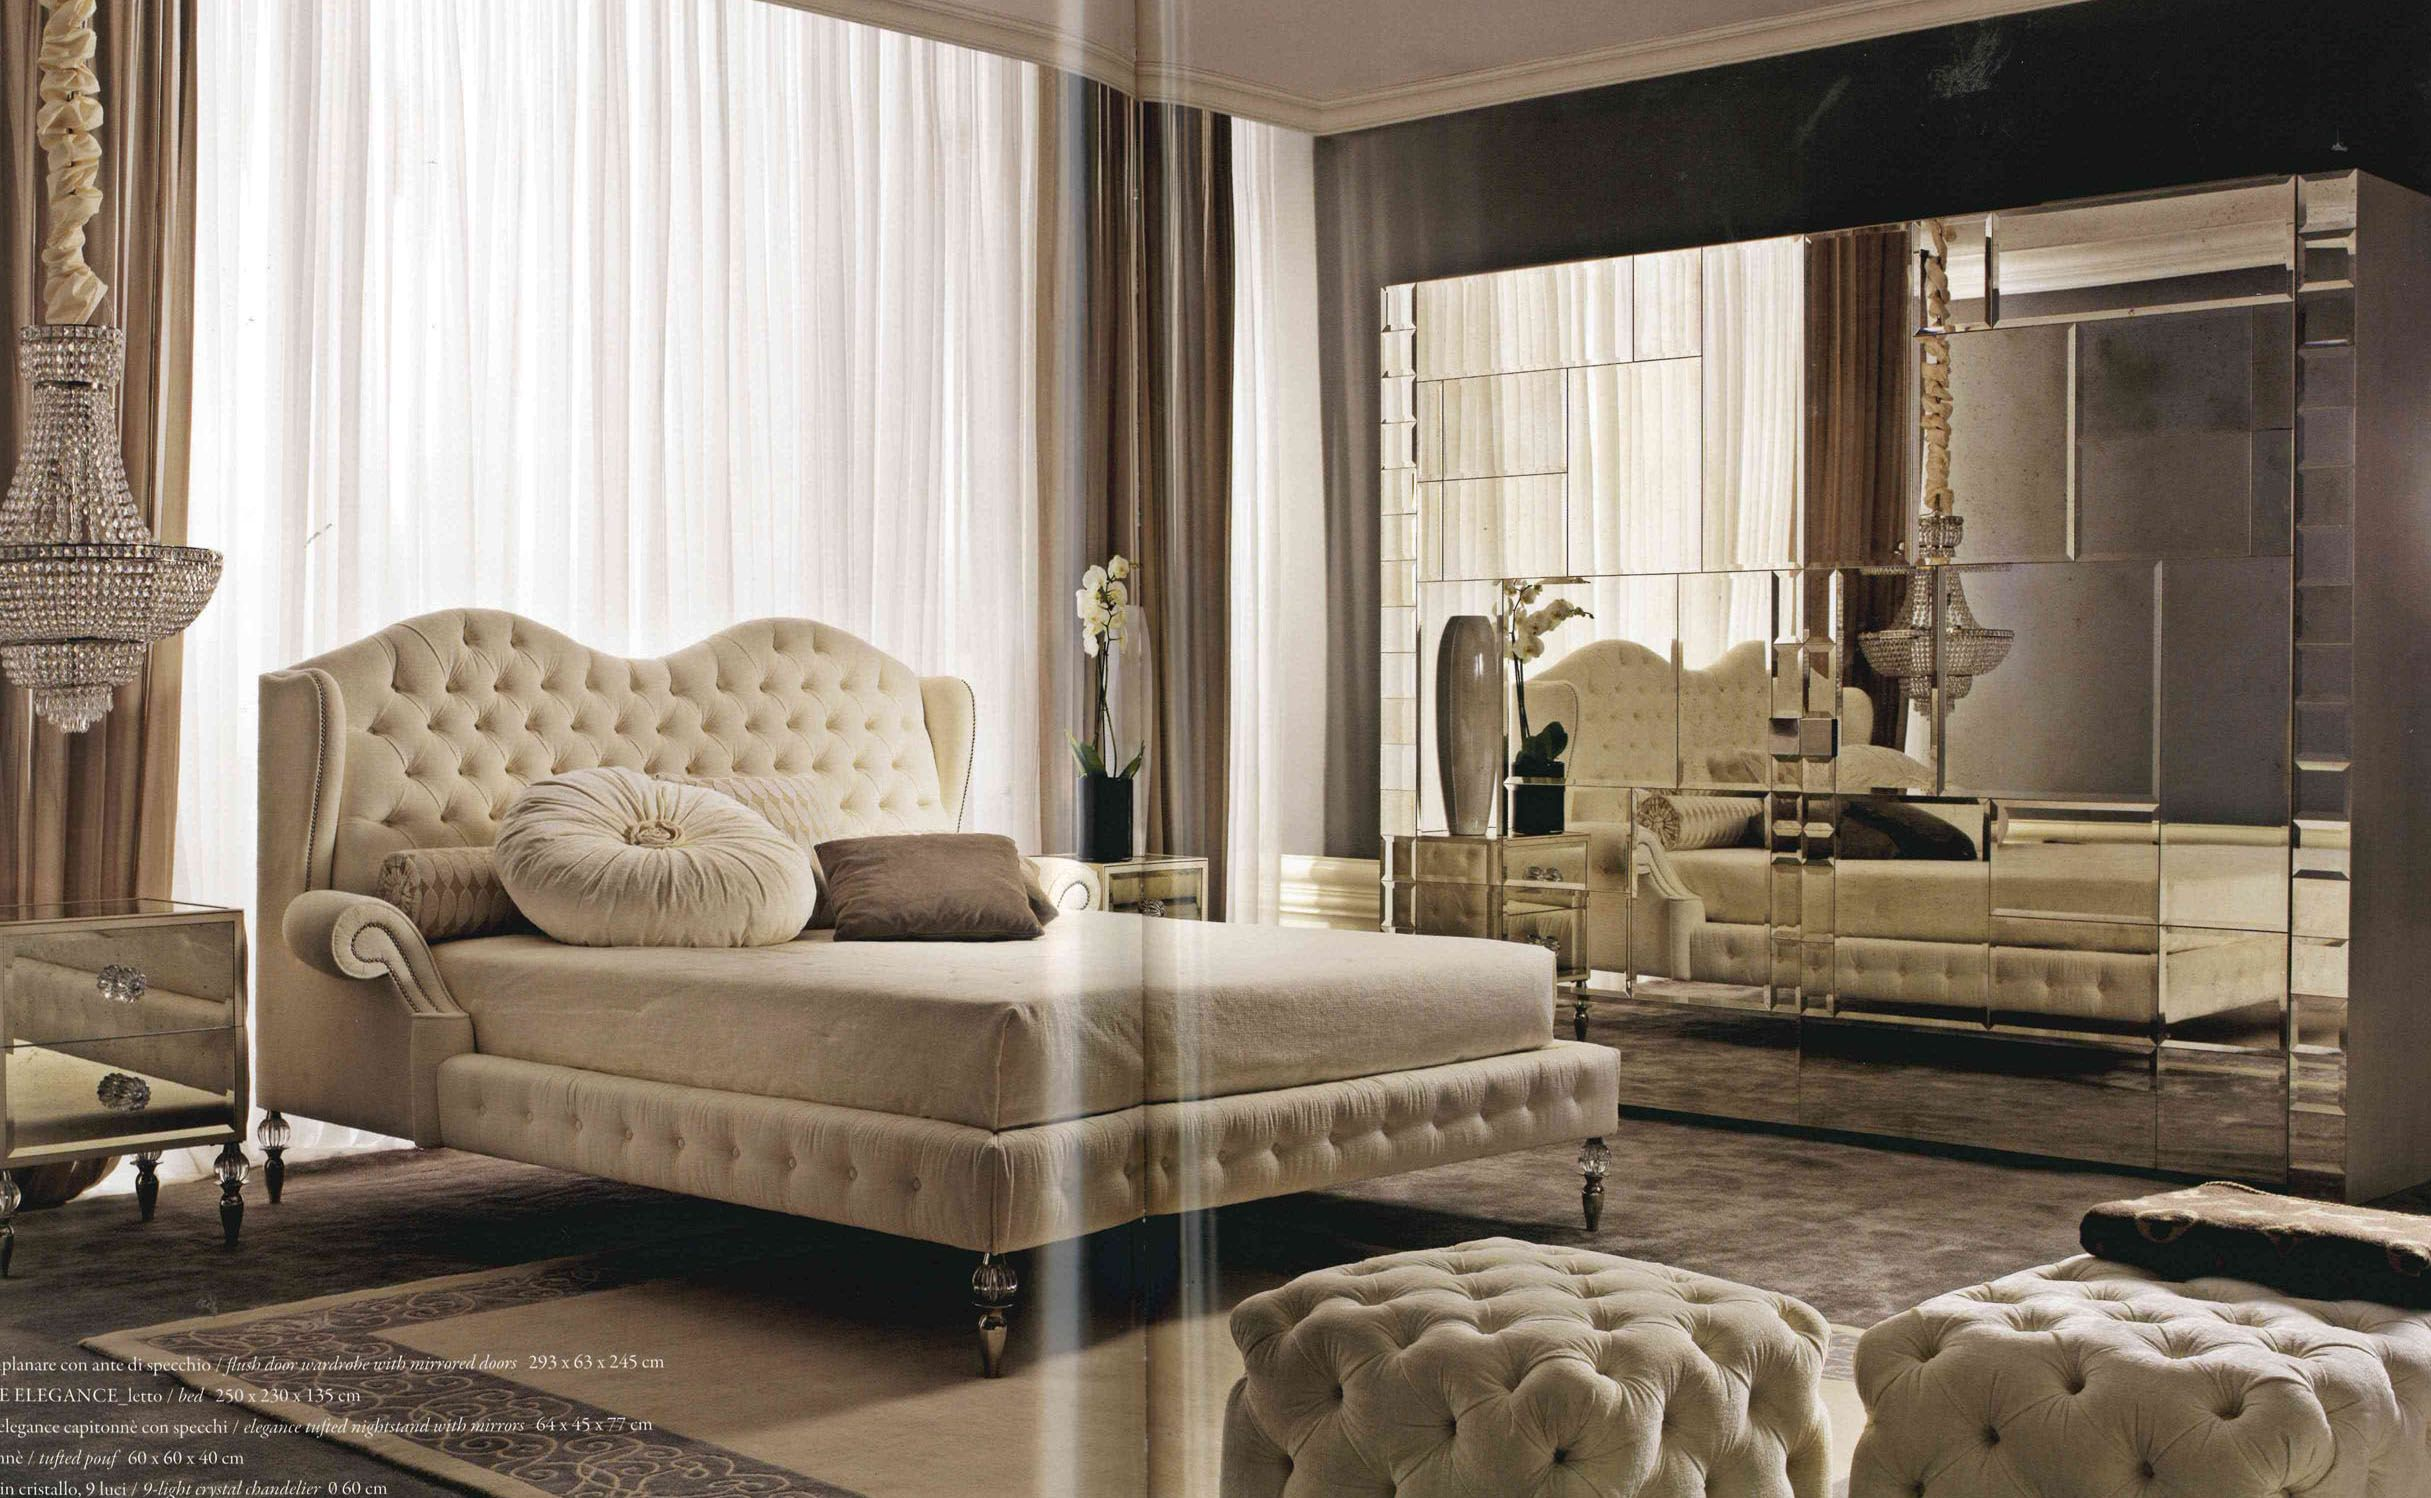 Camere Da Letto Dolfi.Www Wevux Com It S An Italian Business Luxury Furniture 100 Made